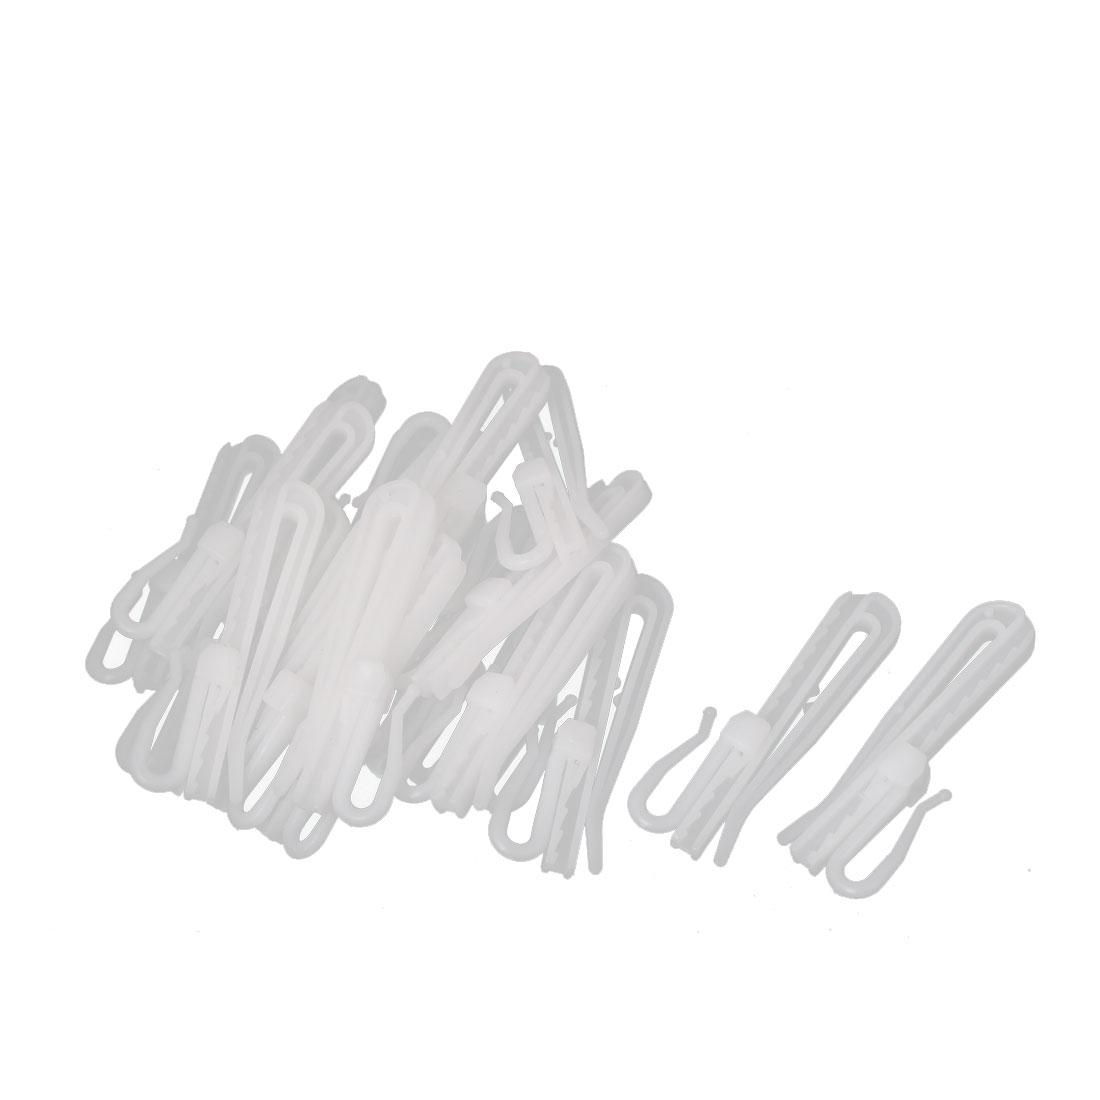 20pcs 7cm Length White Plastic Window Curtain Adjustable Hooks Hangers Clips